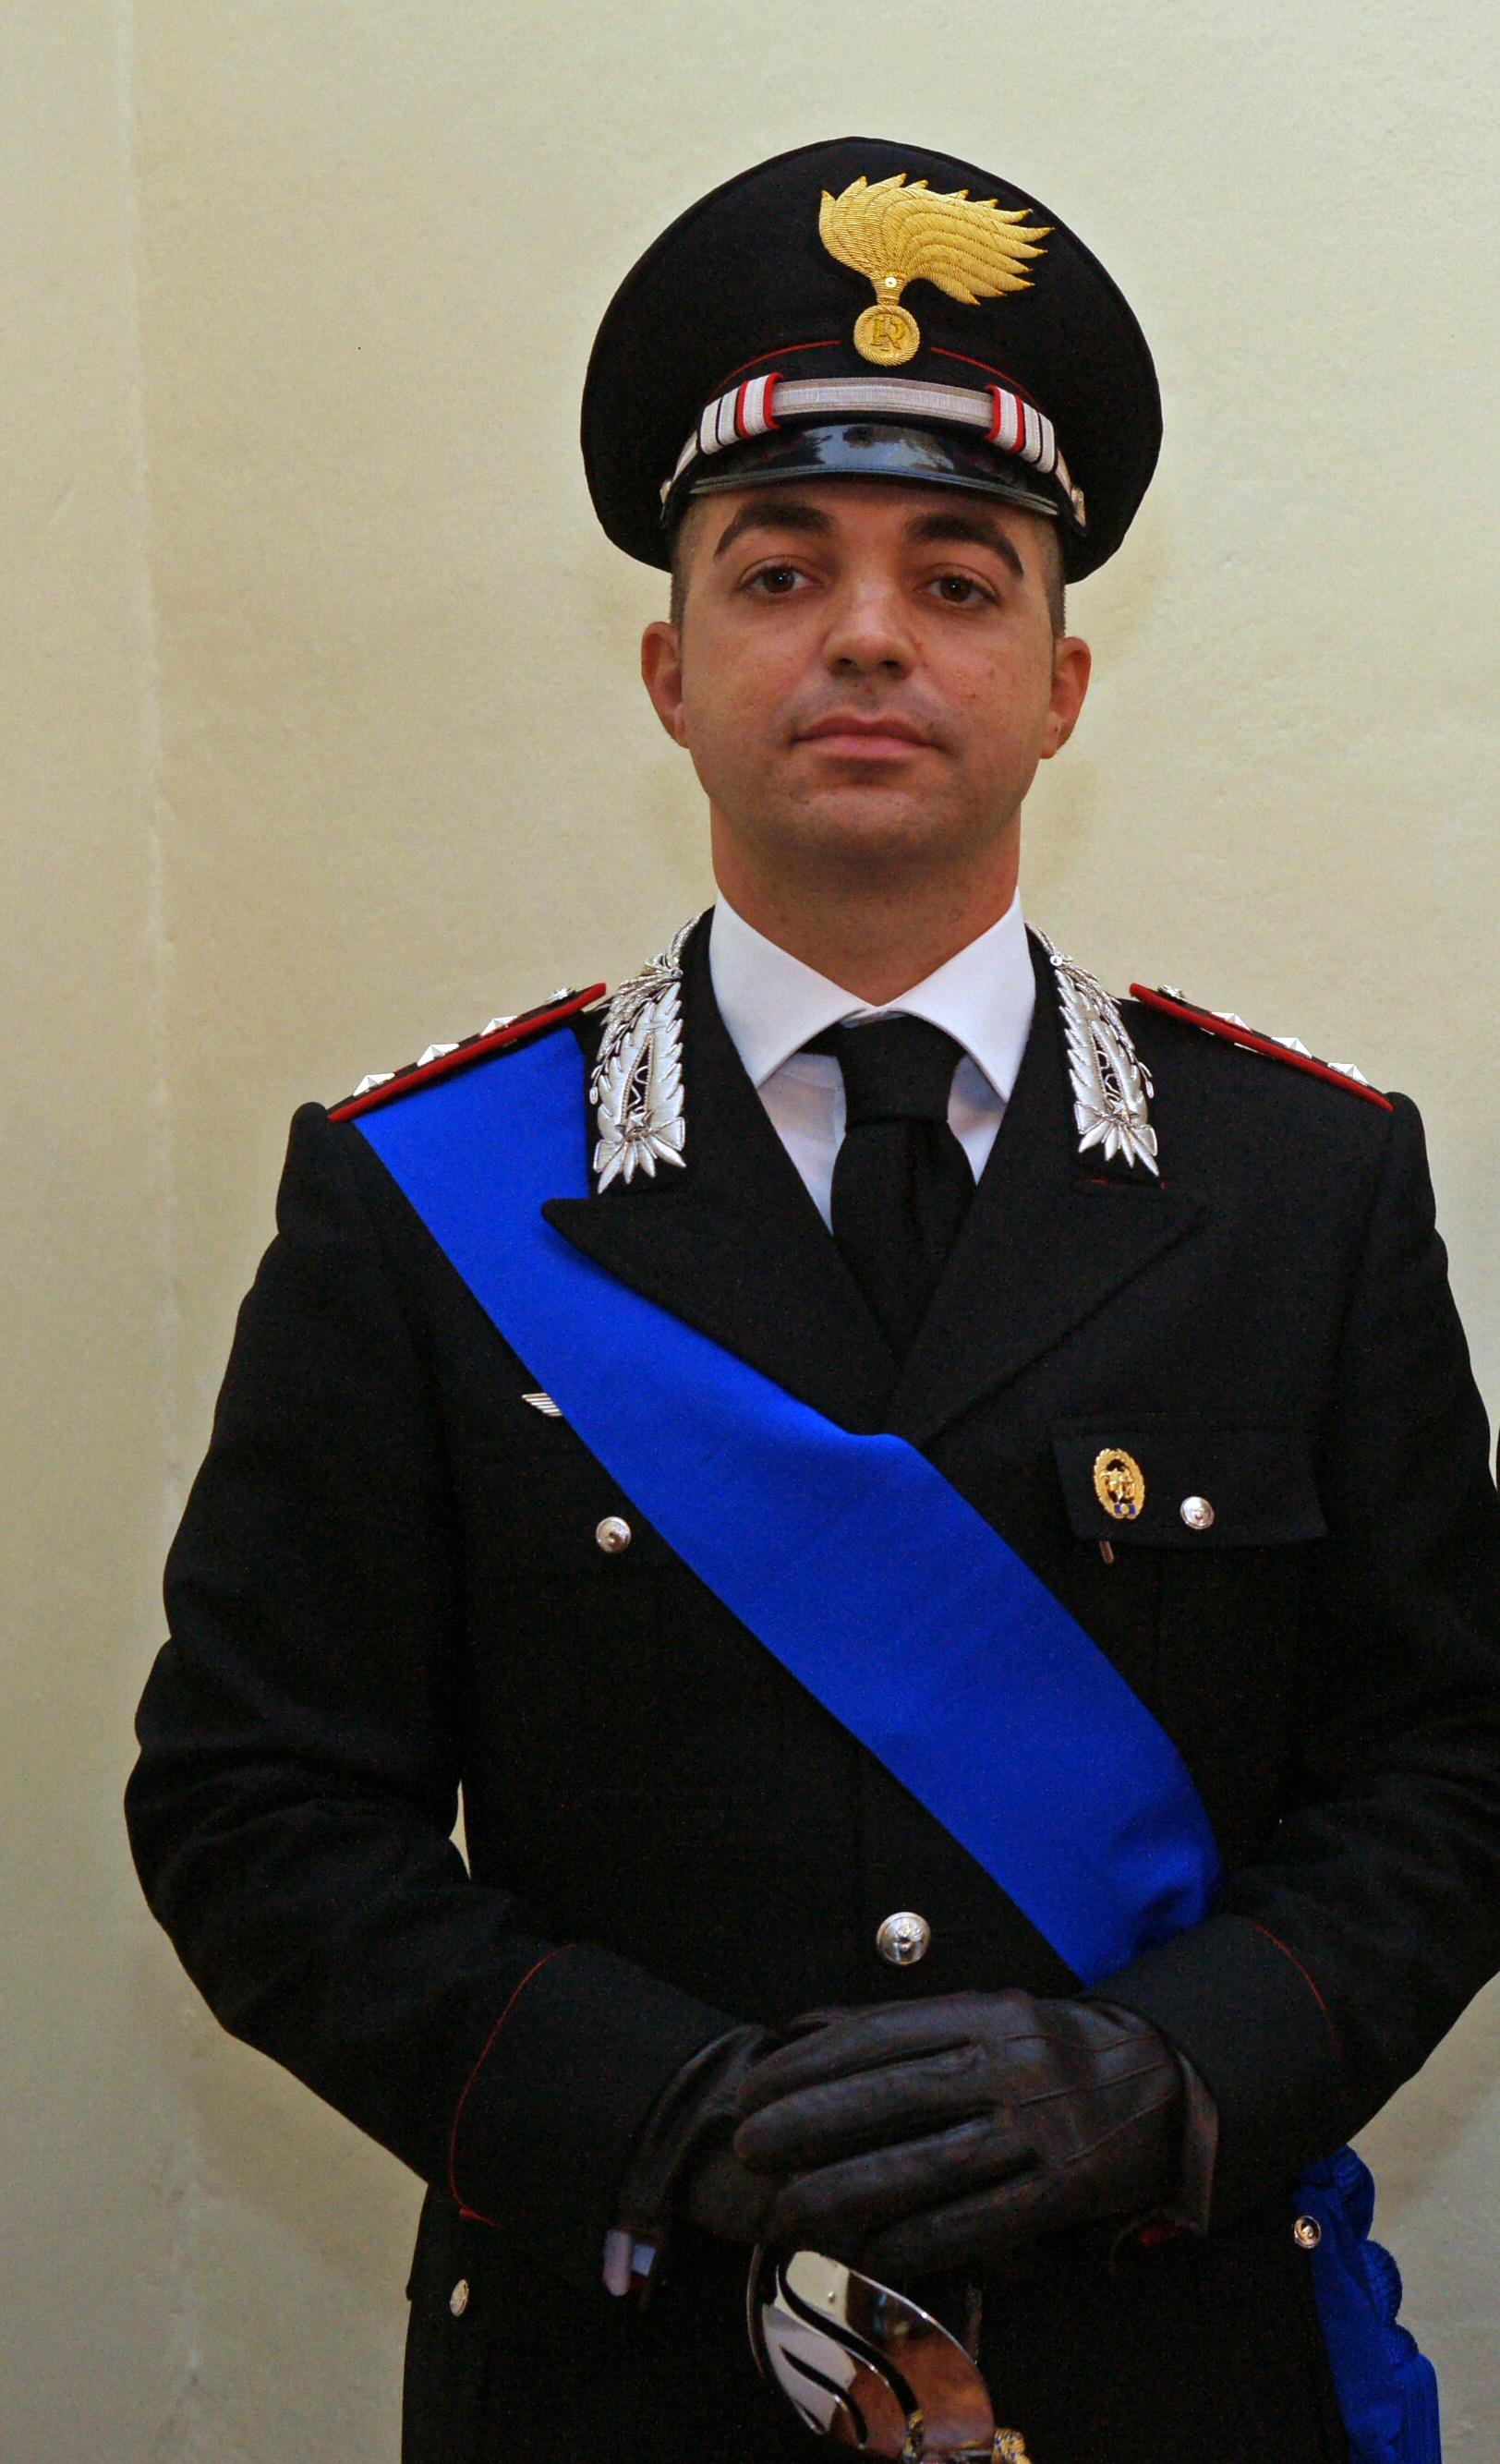 Francesco marchese bilder news infos aus dem web for Francesco marchesi